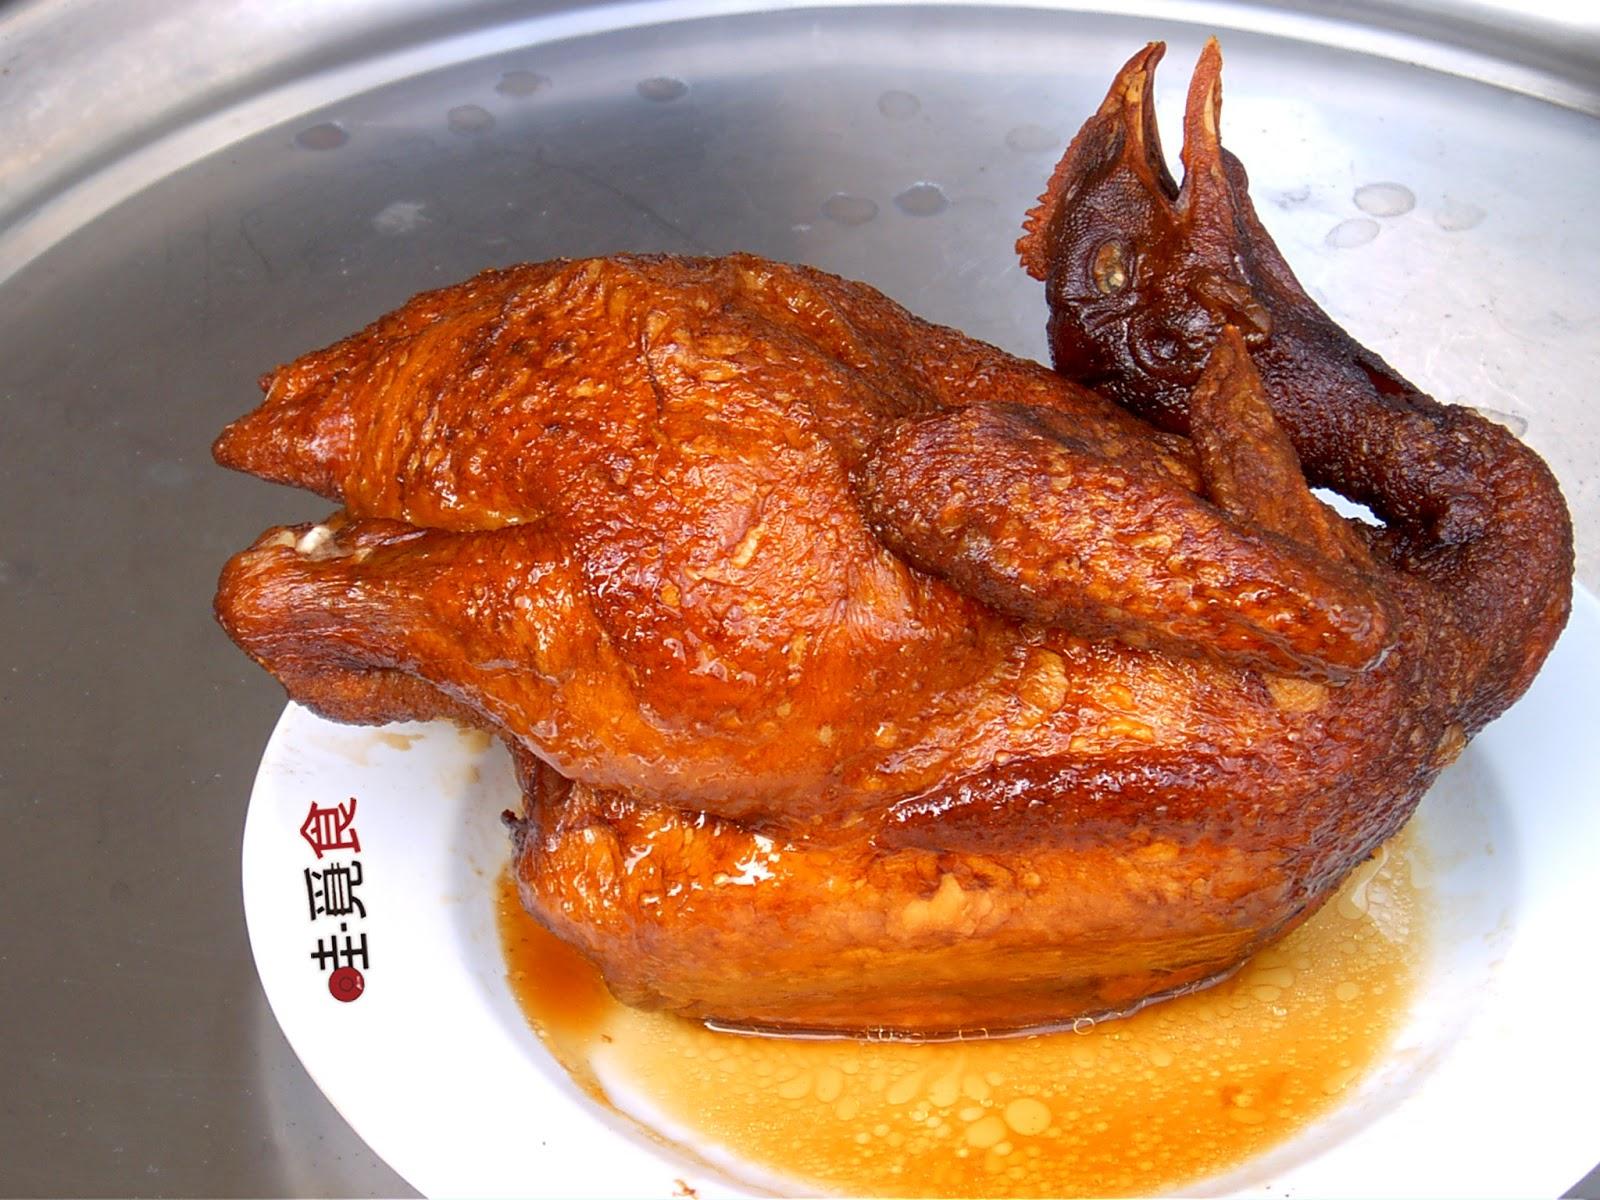 WOW-MISS 愛。覓食: [覓食] 嘉義 X 道口燒雞